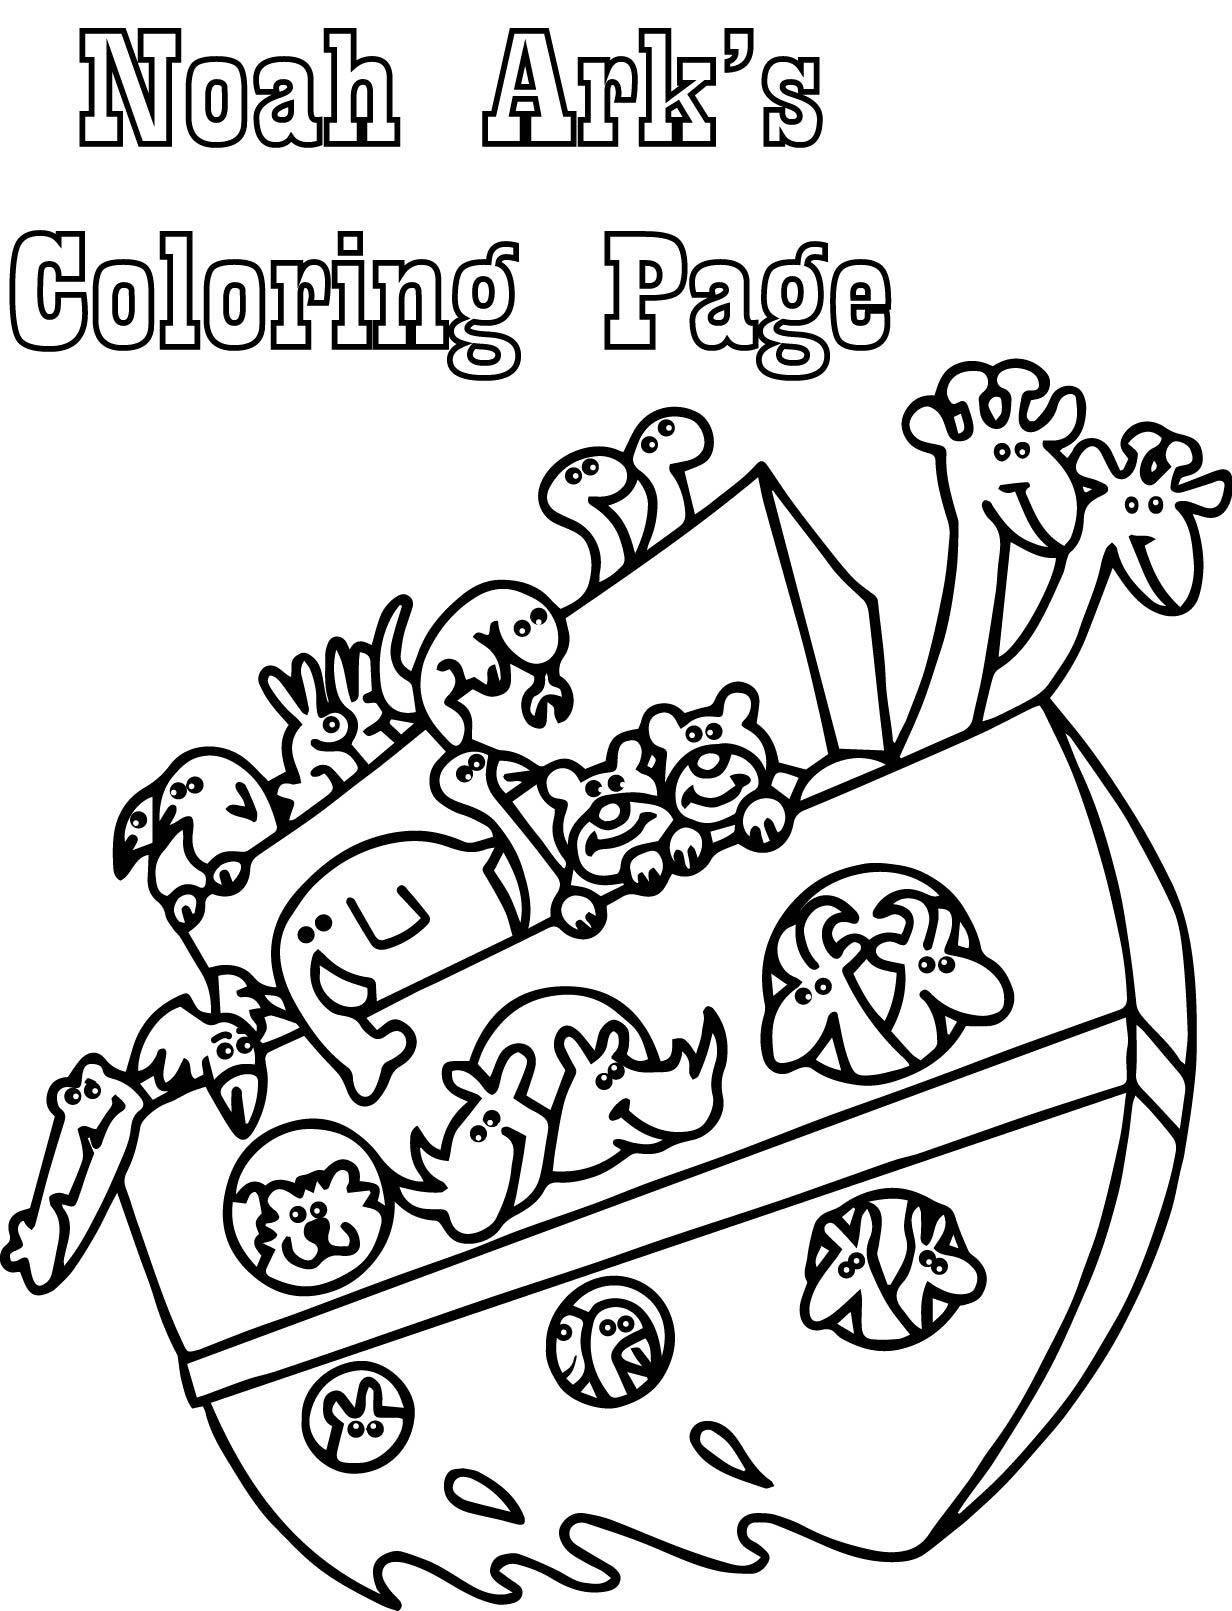 Basic Noah Ark Coloring Page